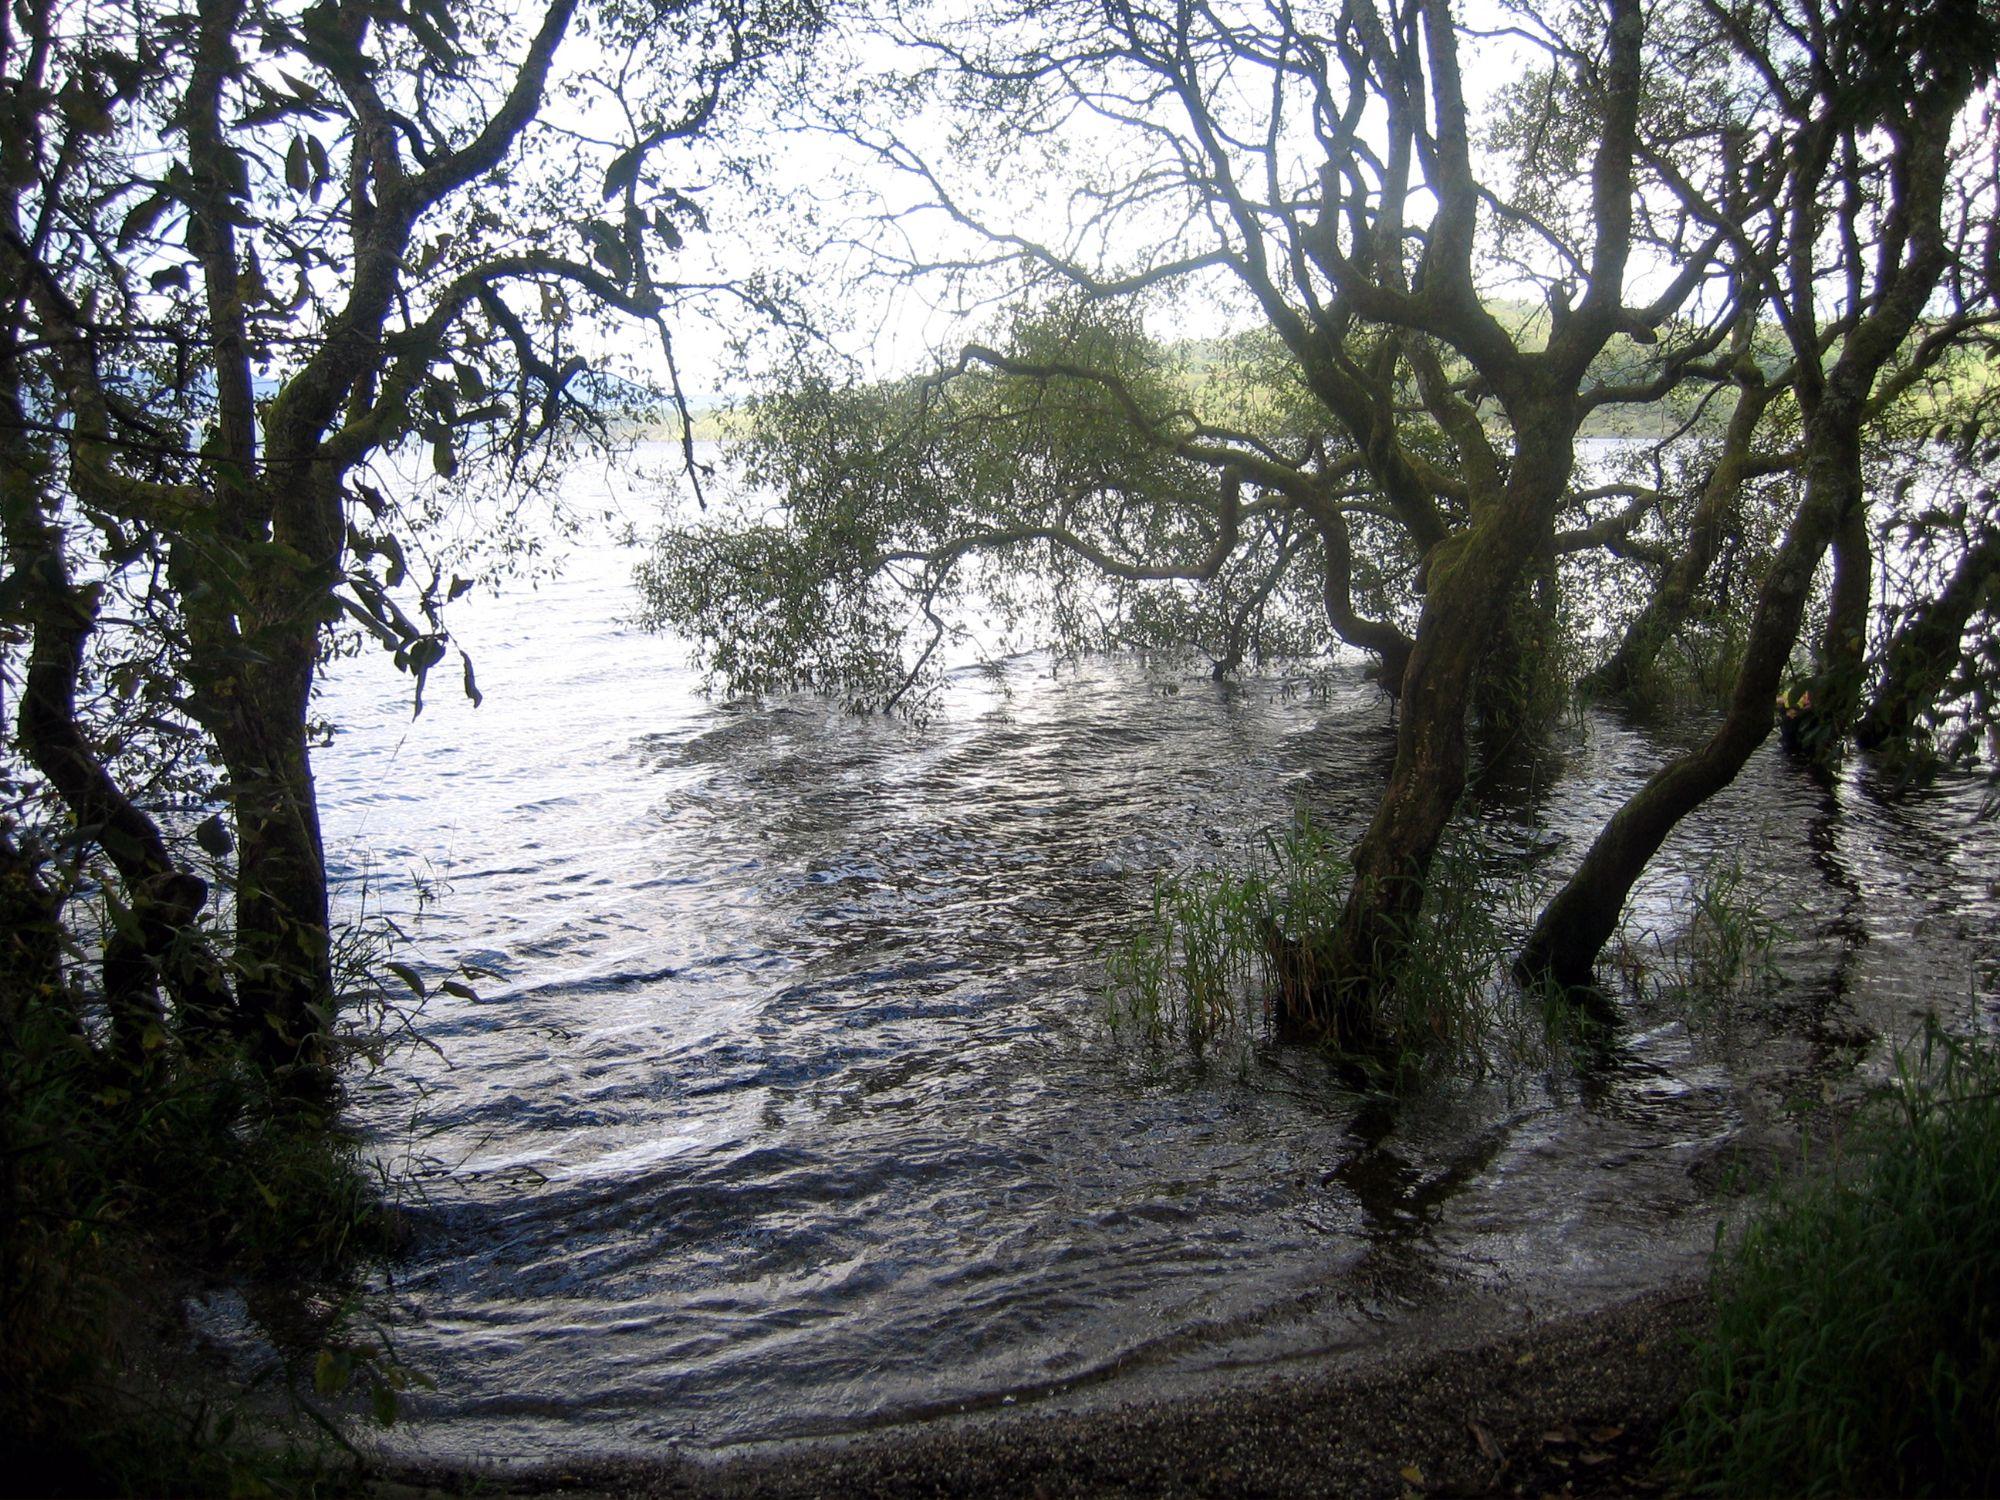 bonnie banks (Loch Lomond)